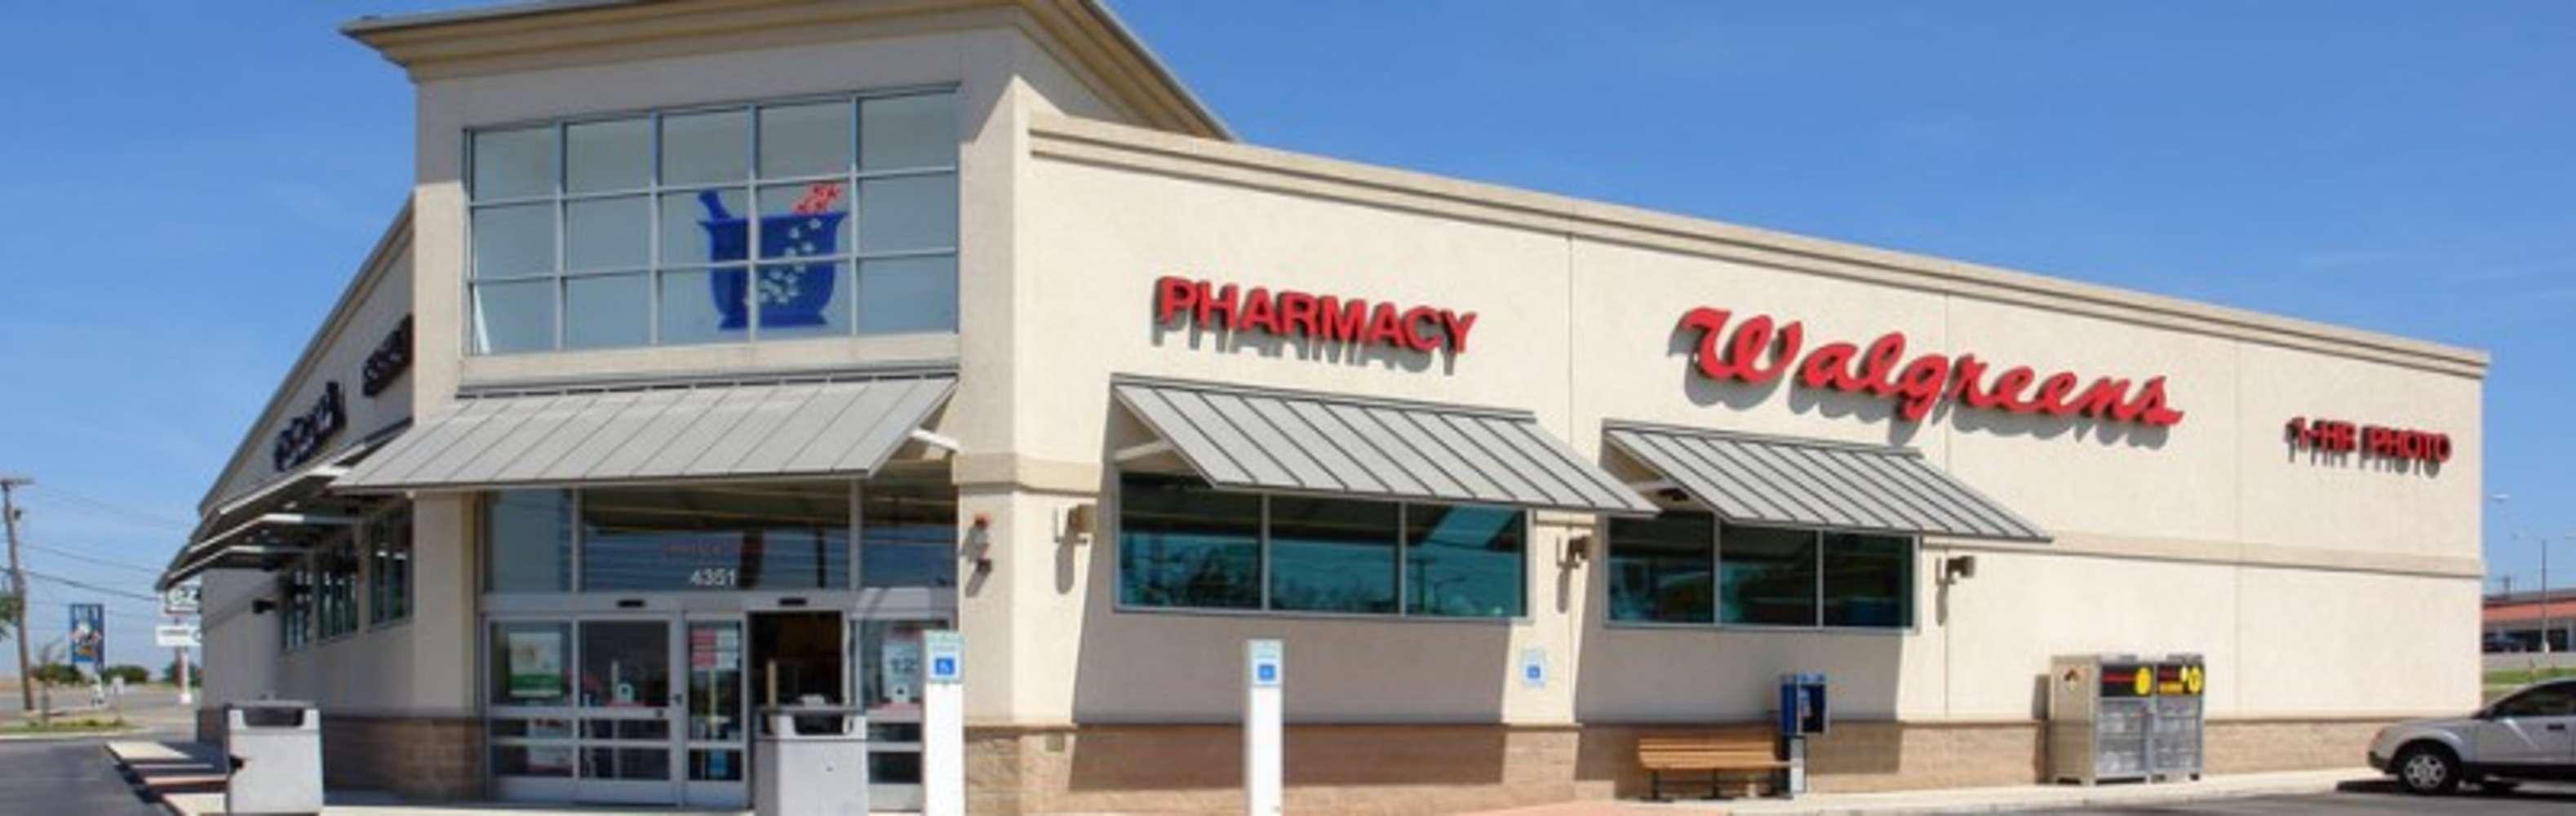 Retail San antonio - Walgreens 7308 - THOUSAND OAKS DR - San Antonio, TX